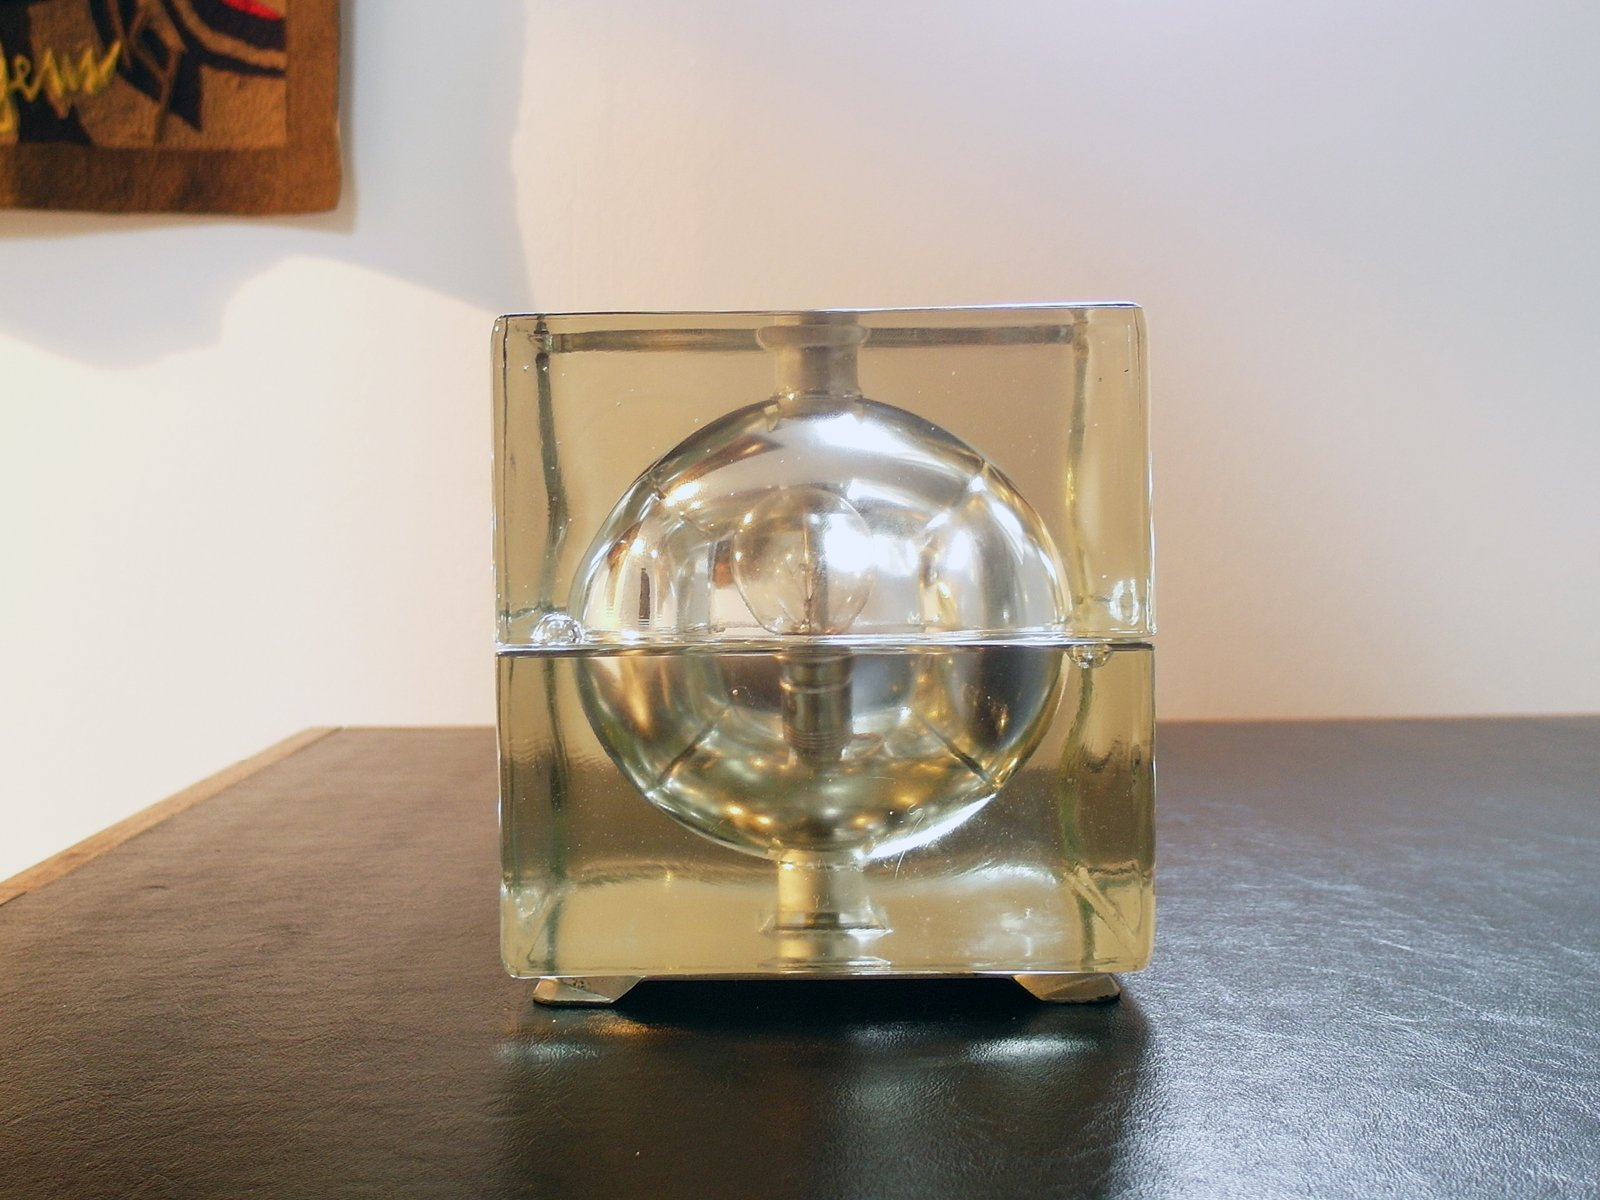 Cubosfera Tischlampe von Alessandro Mendini für Fidenza Vetraria, 1968